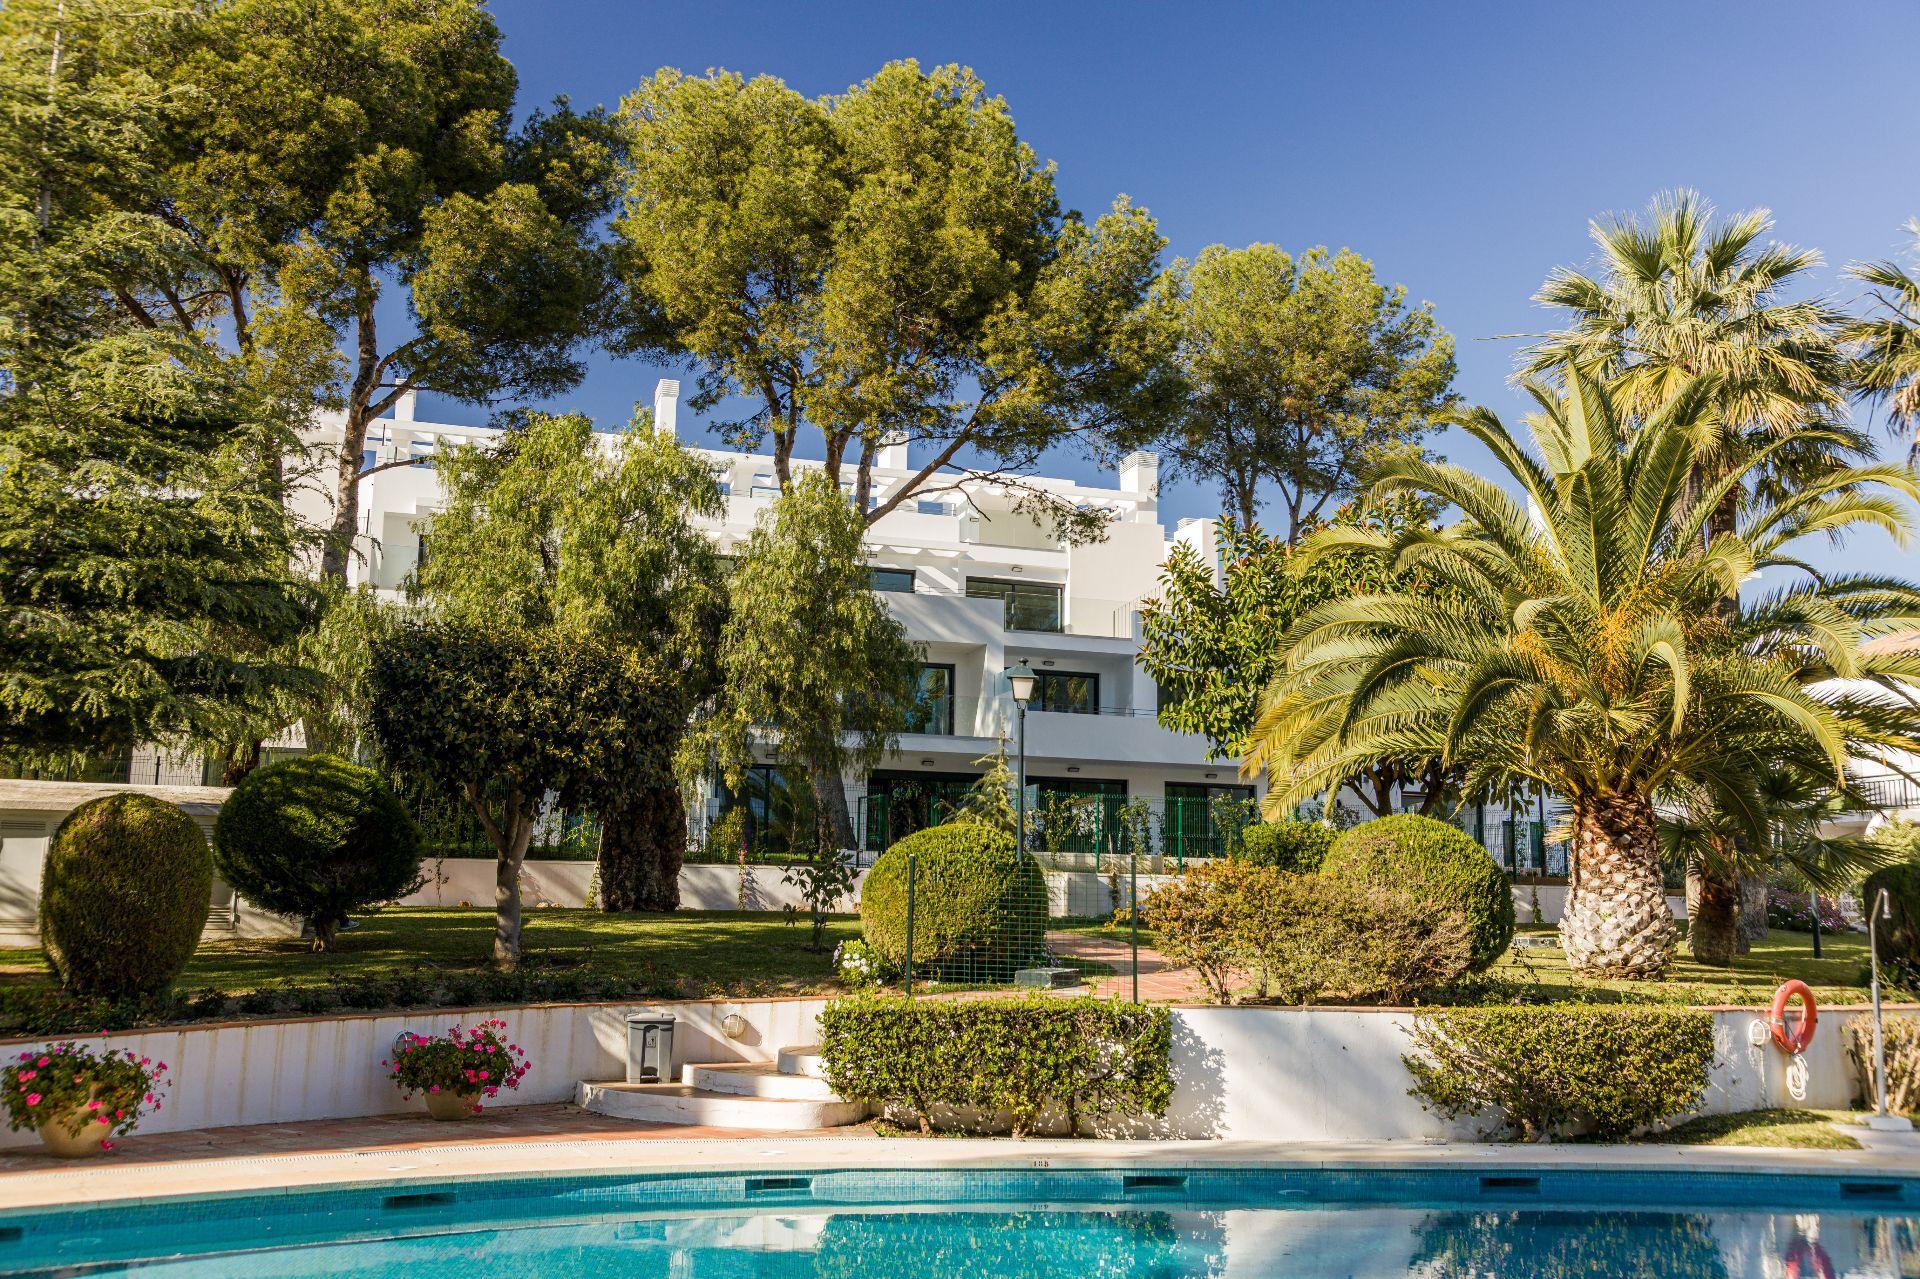 Apartamento en Marbella, Naguelles Alto, alquiler